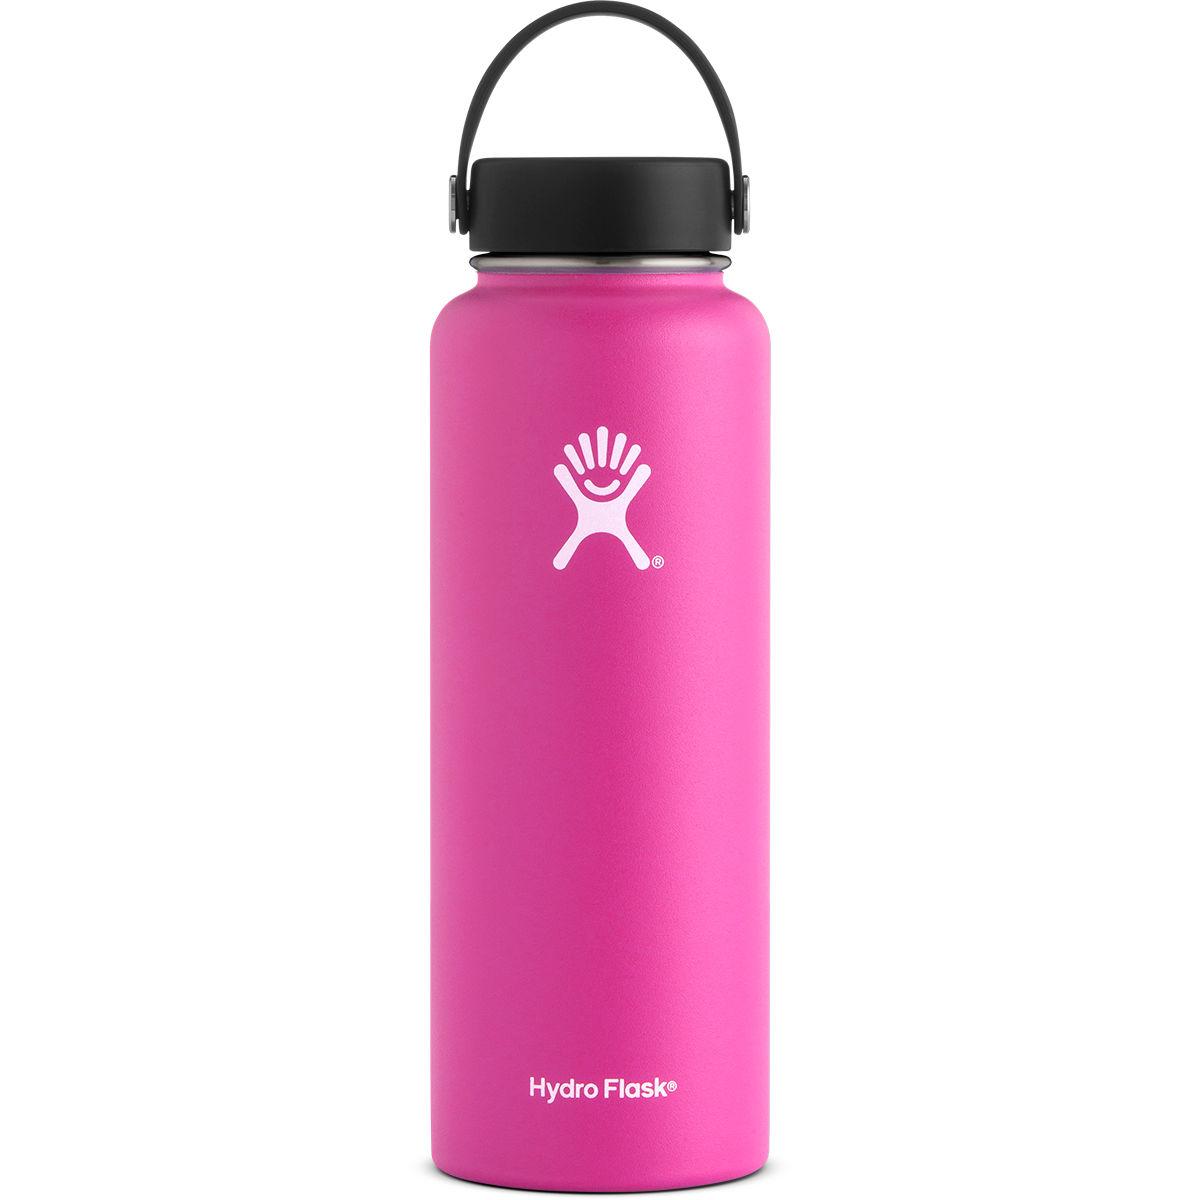 Hydro Flask 40 Oz. Wide Mouth Water Bottle